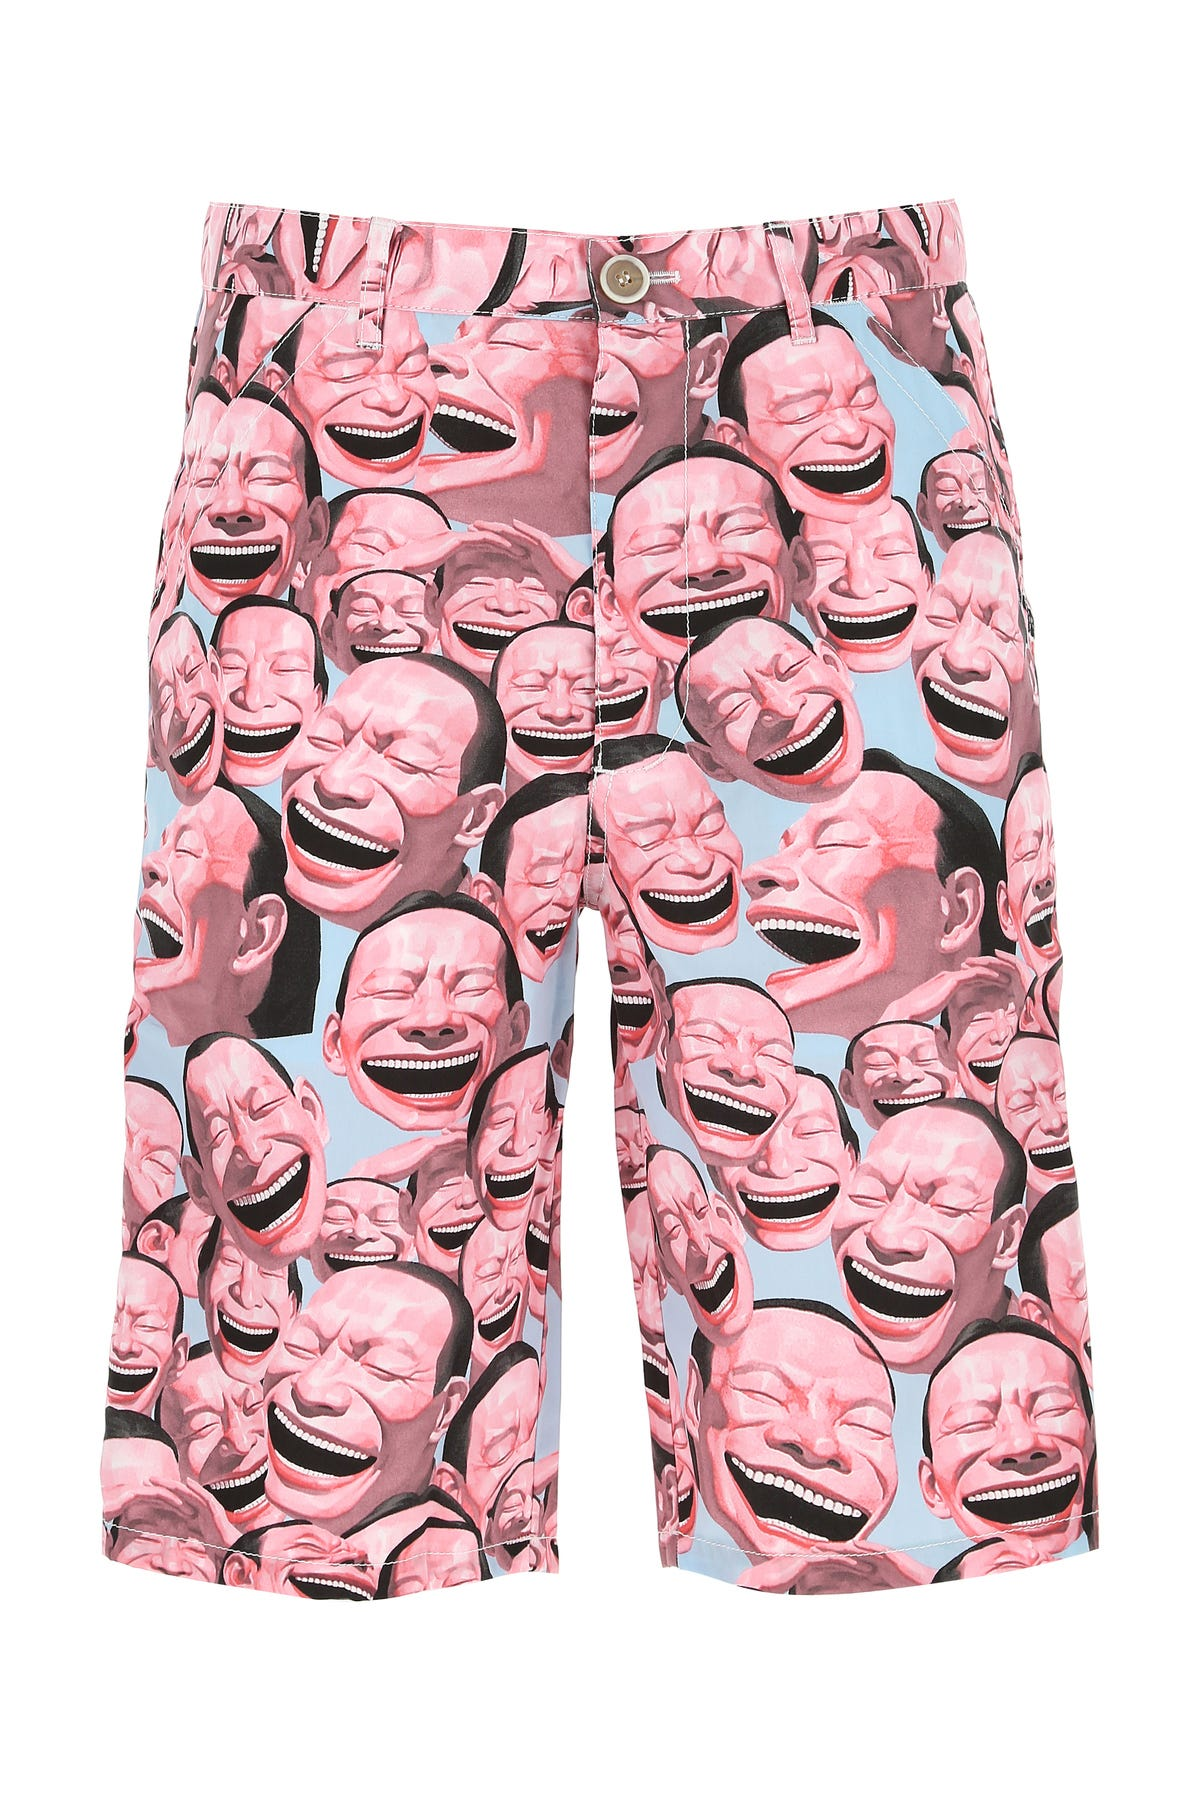 Comme Des Garçons Shirt Shorts PANTALONE-M